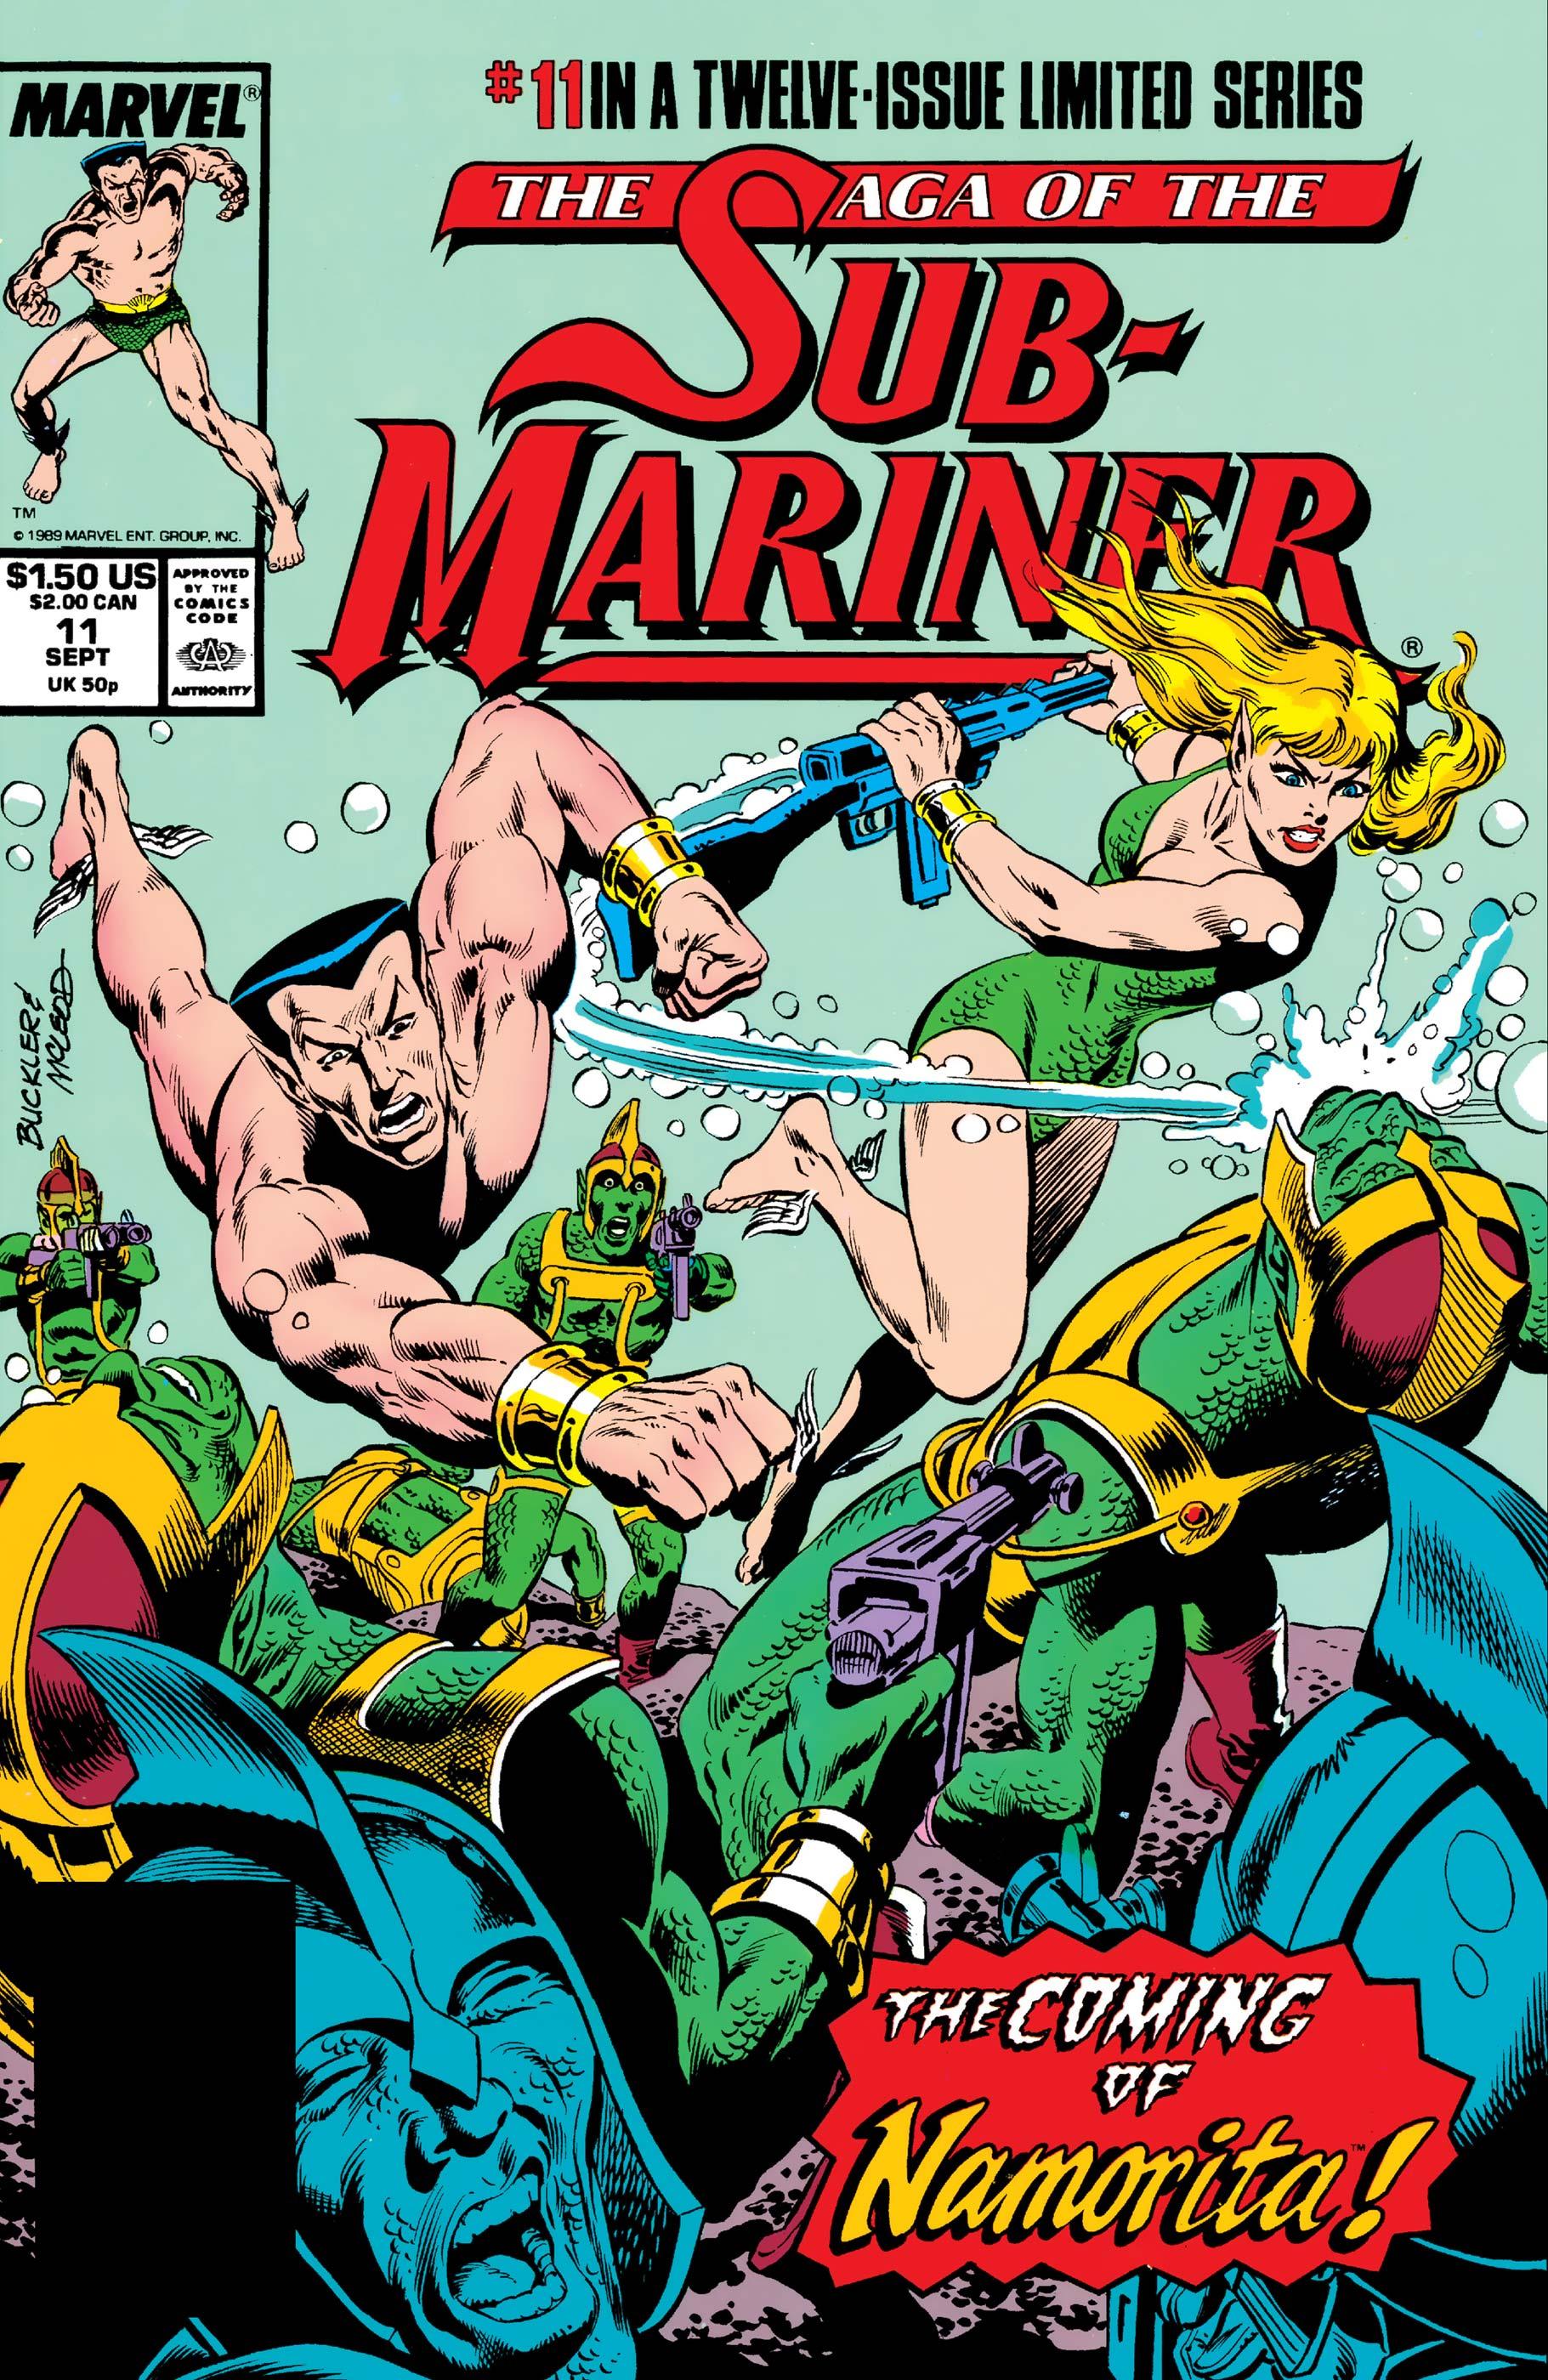 Saga of the Sub-Mariner (1988) #11